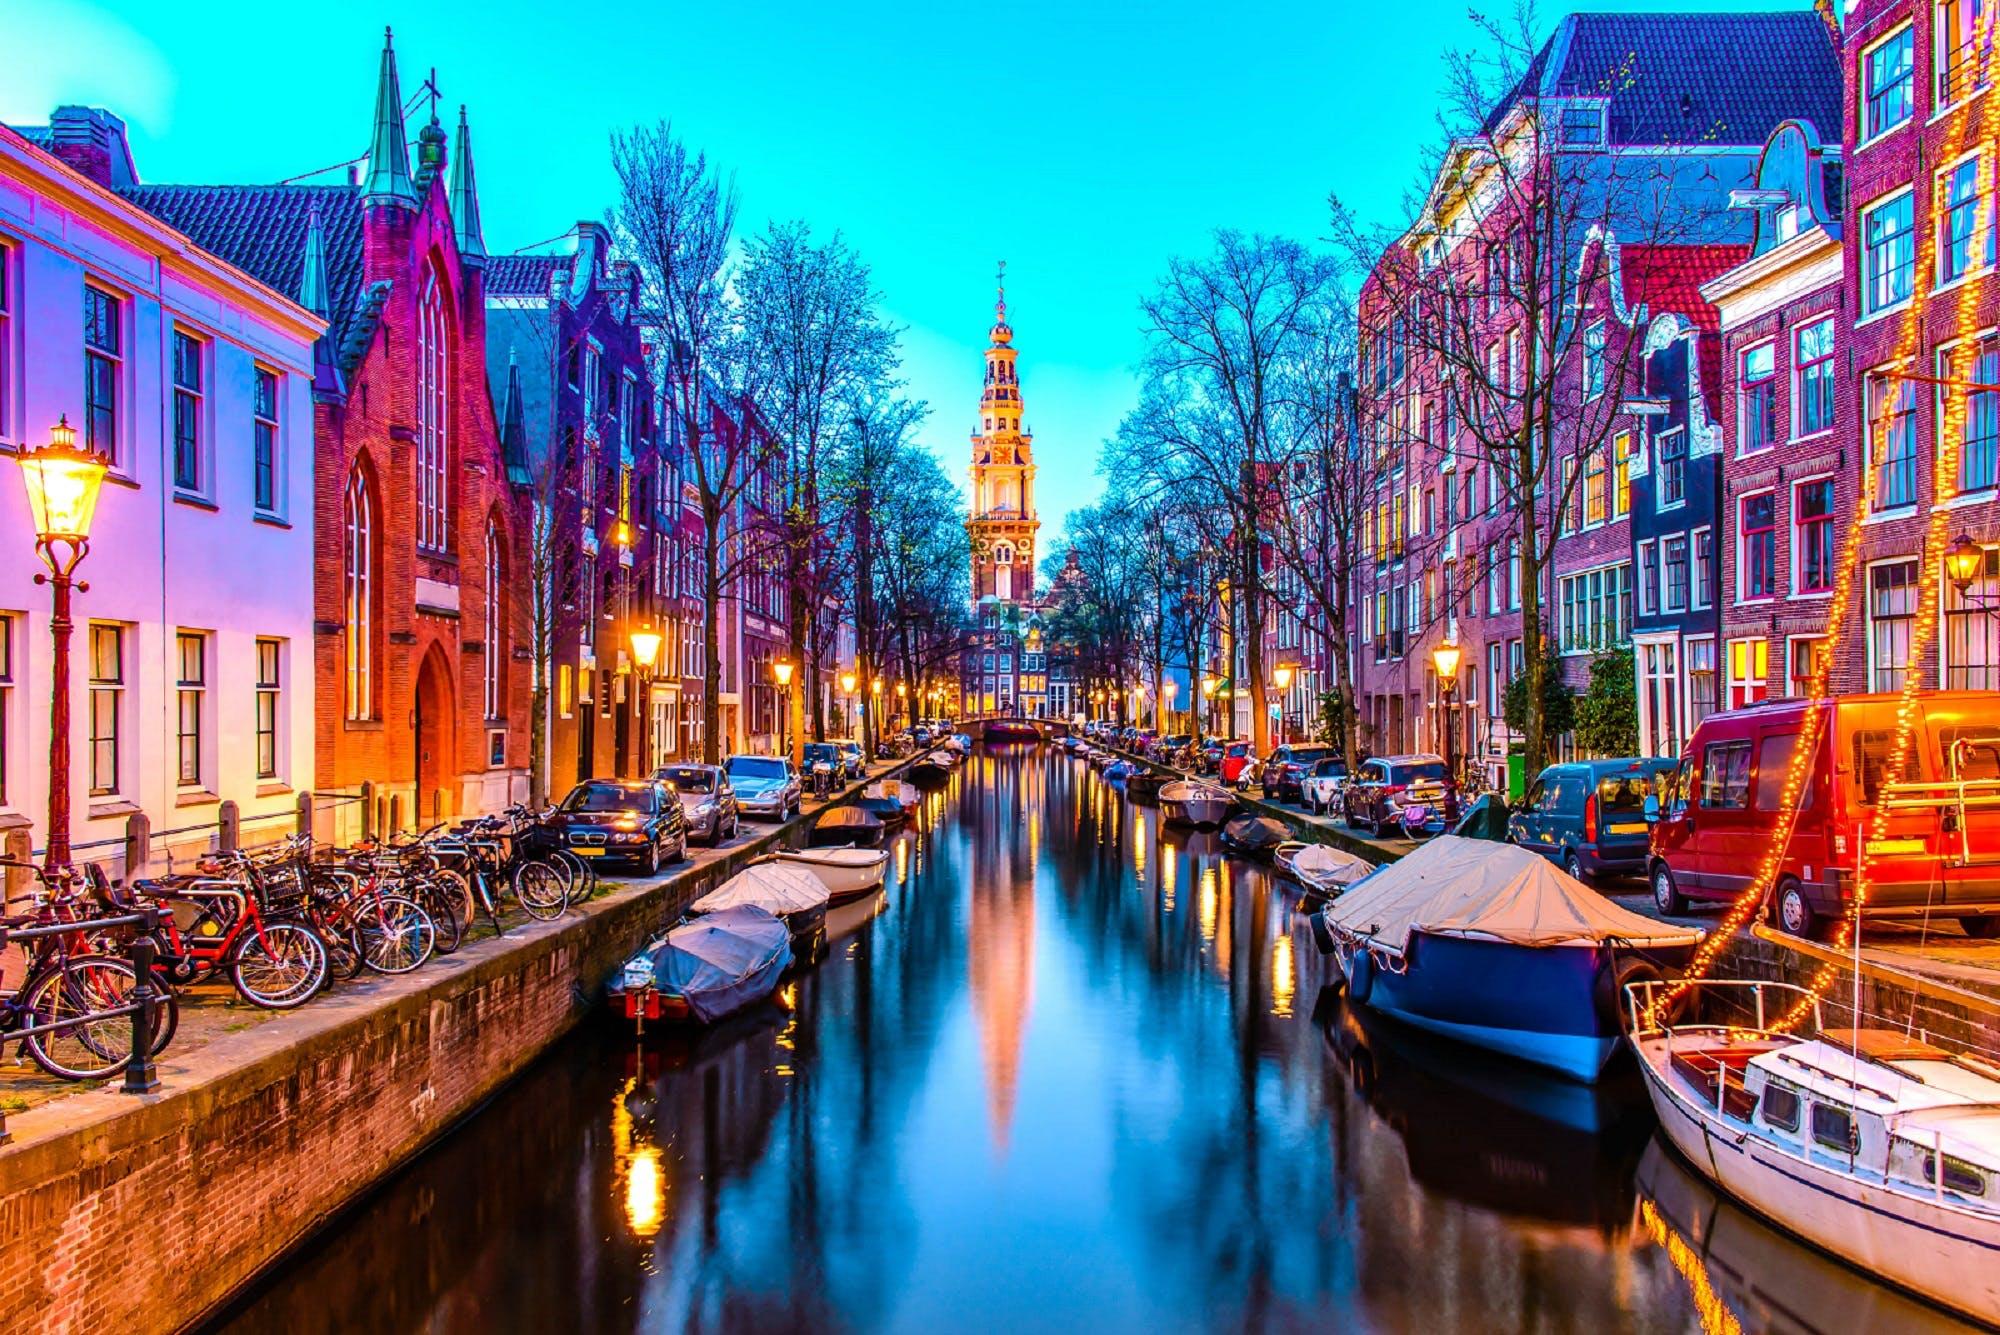 Zuiderkerk-in-Amsterdam-iStock-528503566-2_titeljpg